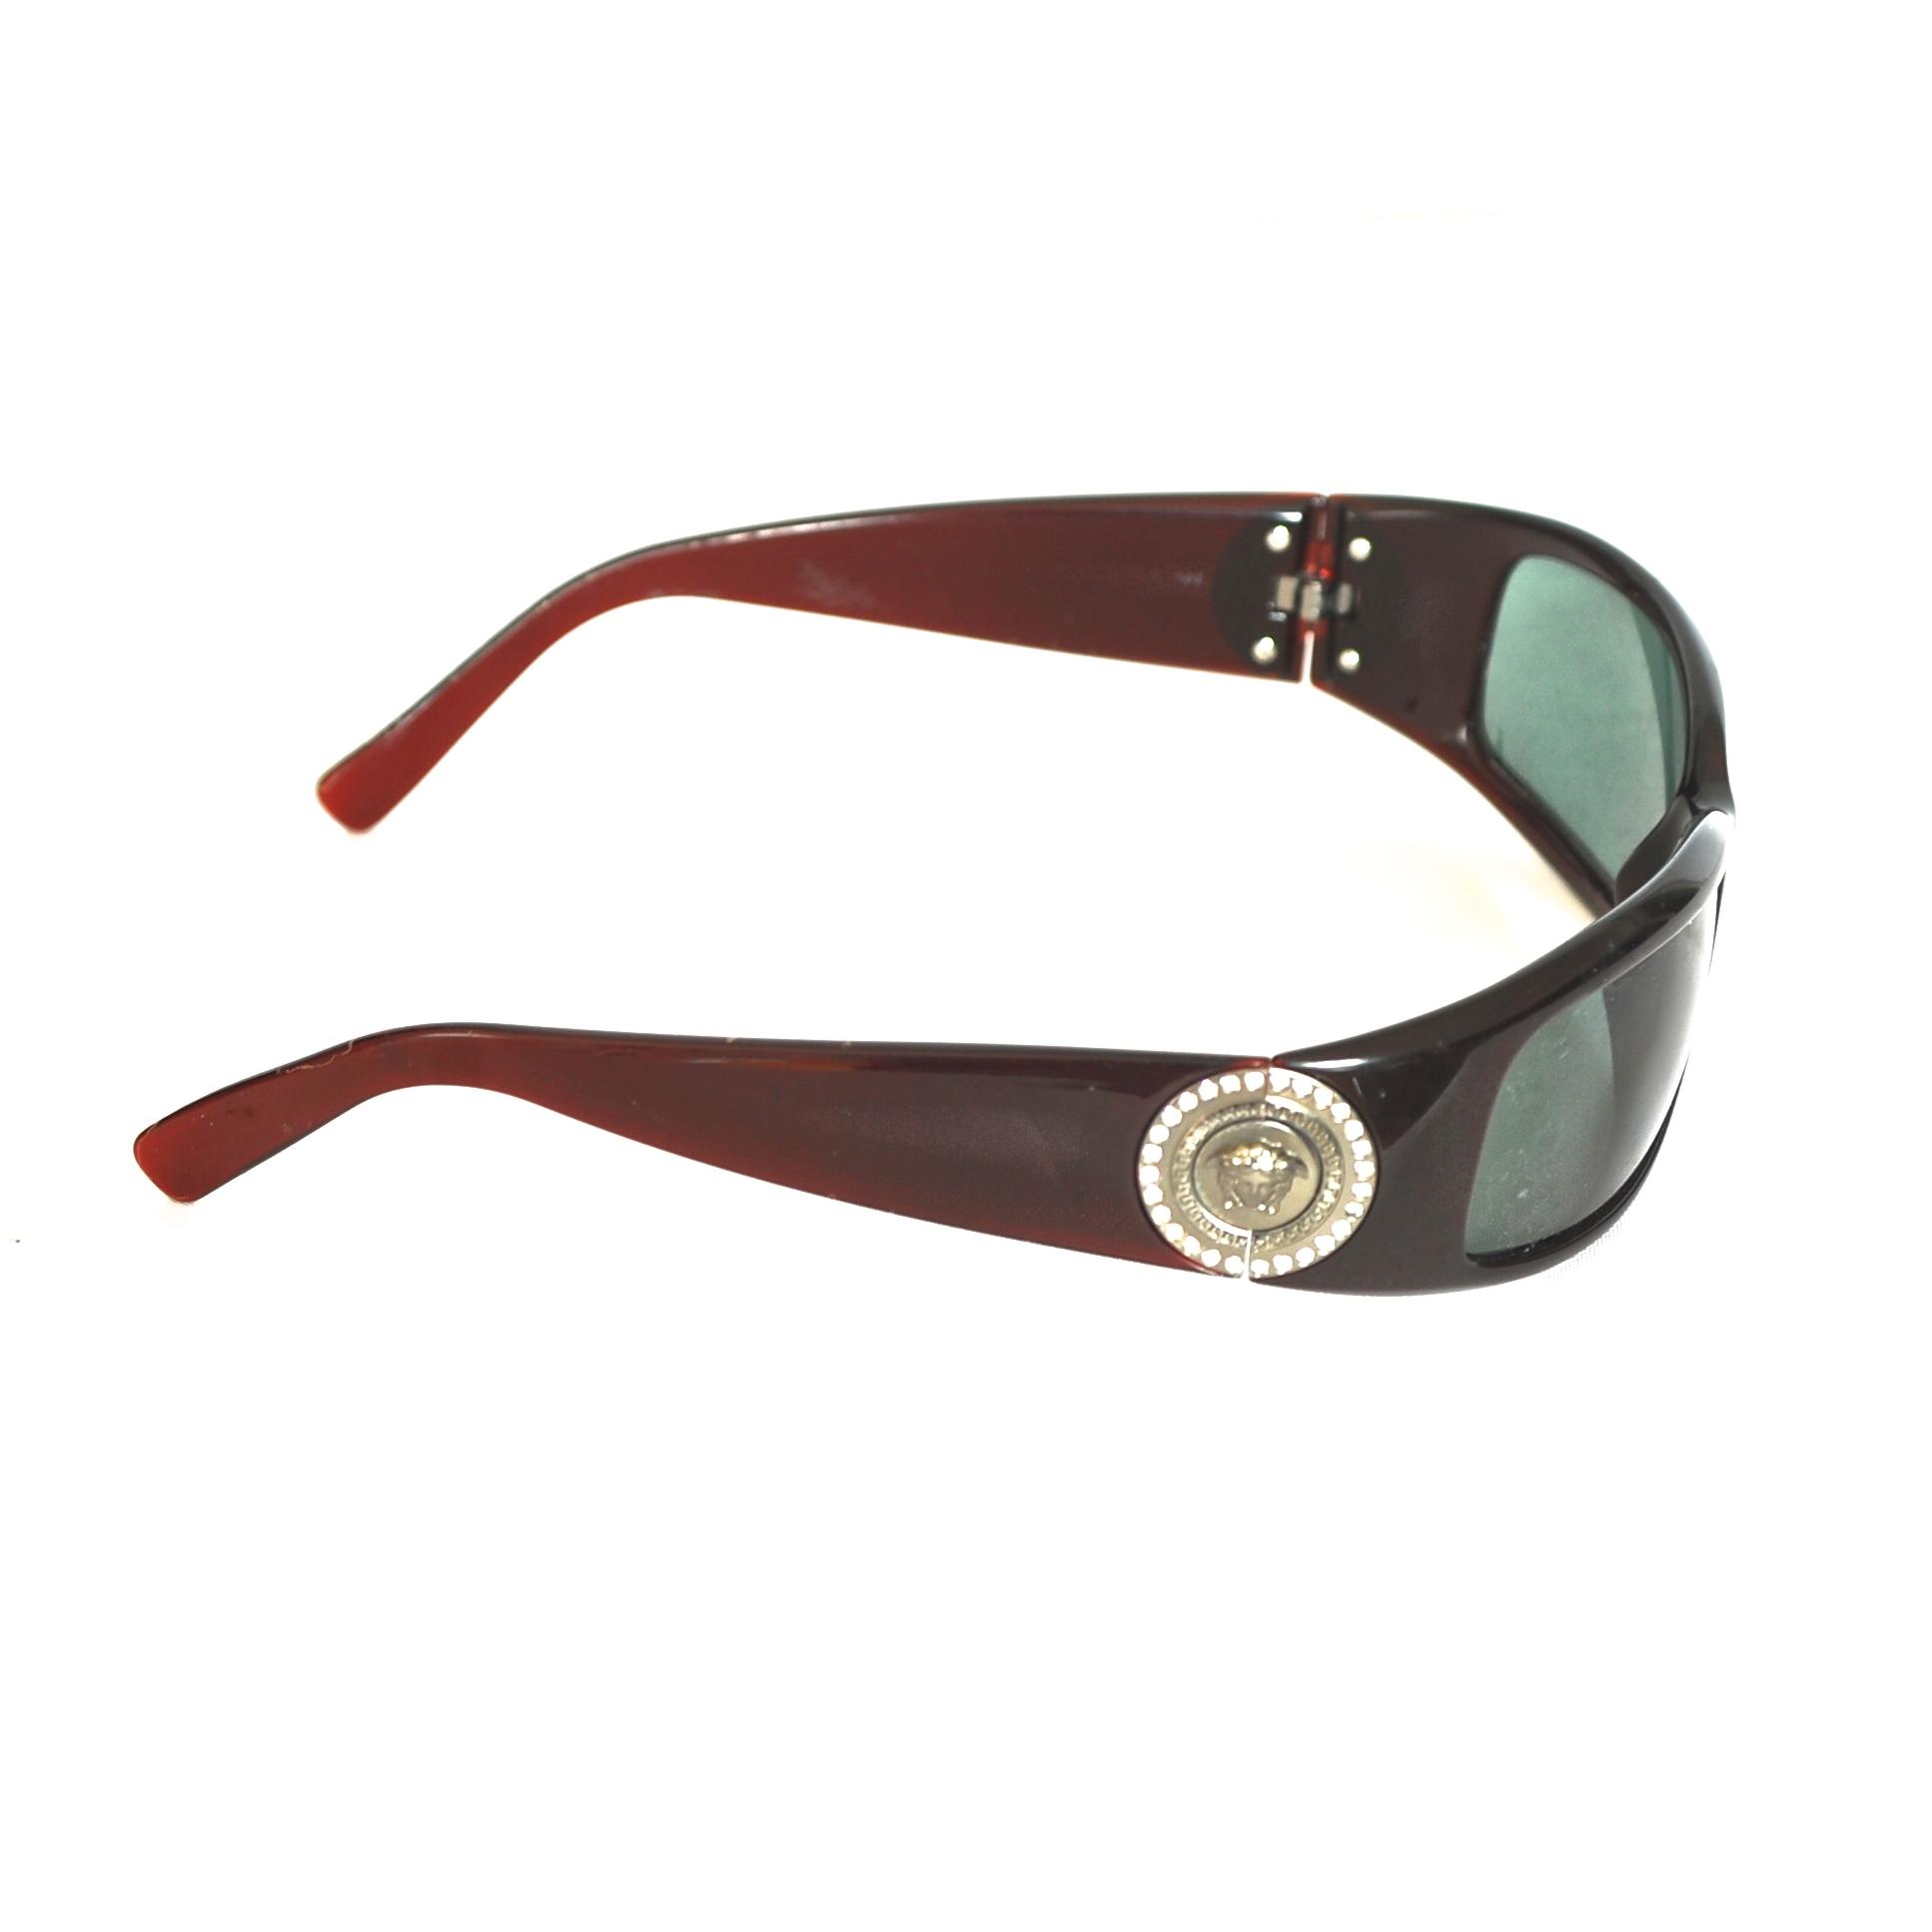 bf940792e337 Versace 1990 s Wraparound Sunglasses With Flashy Round Logo On Arms – Italy